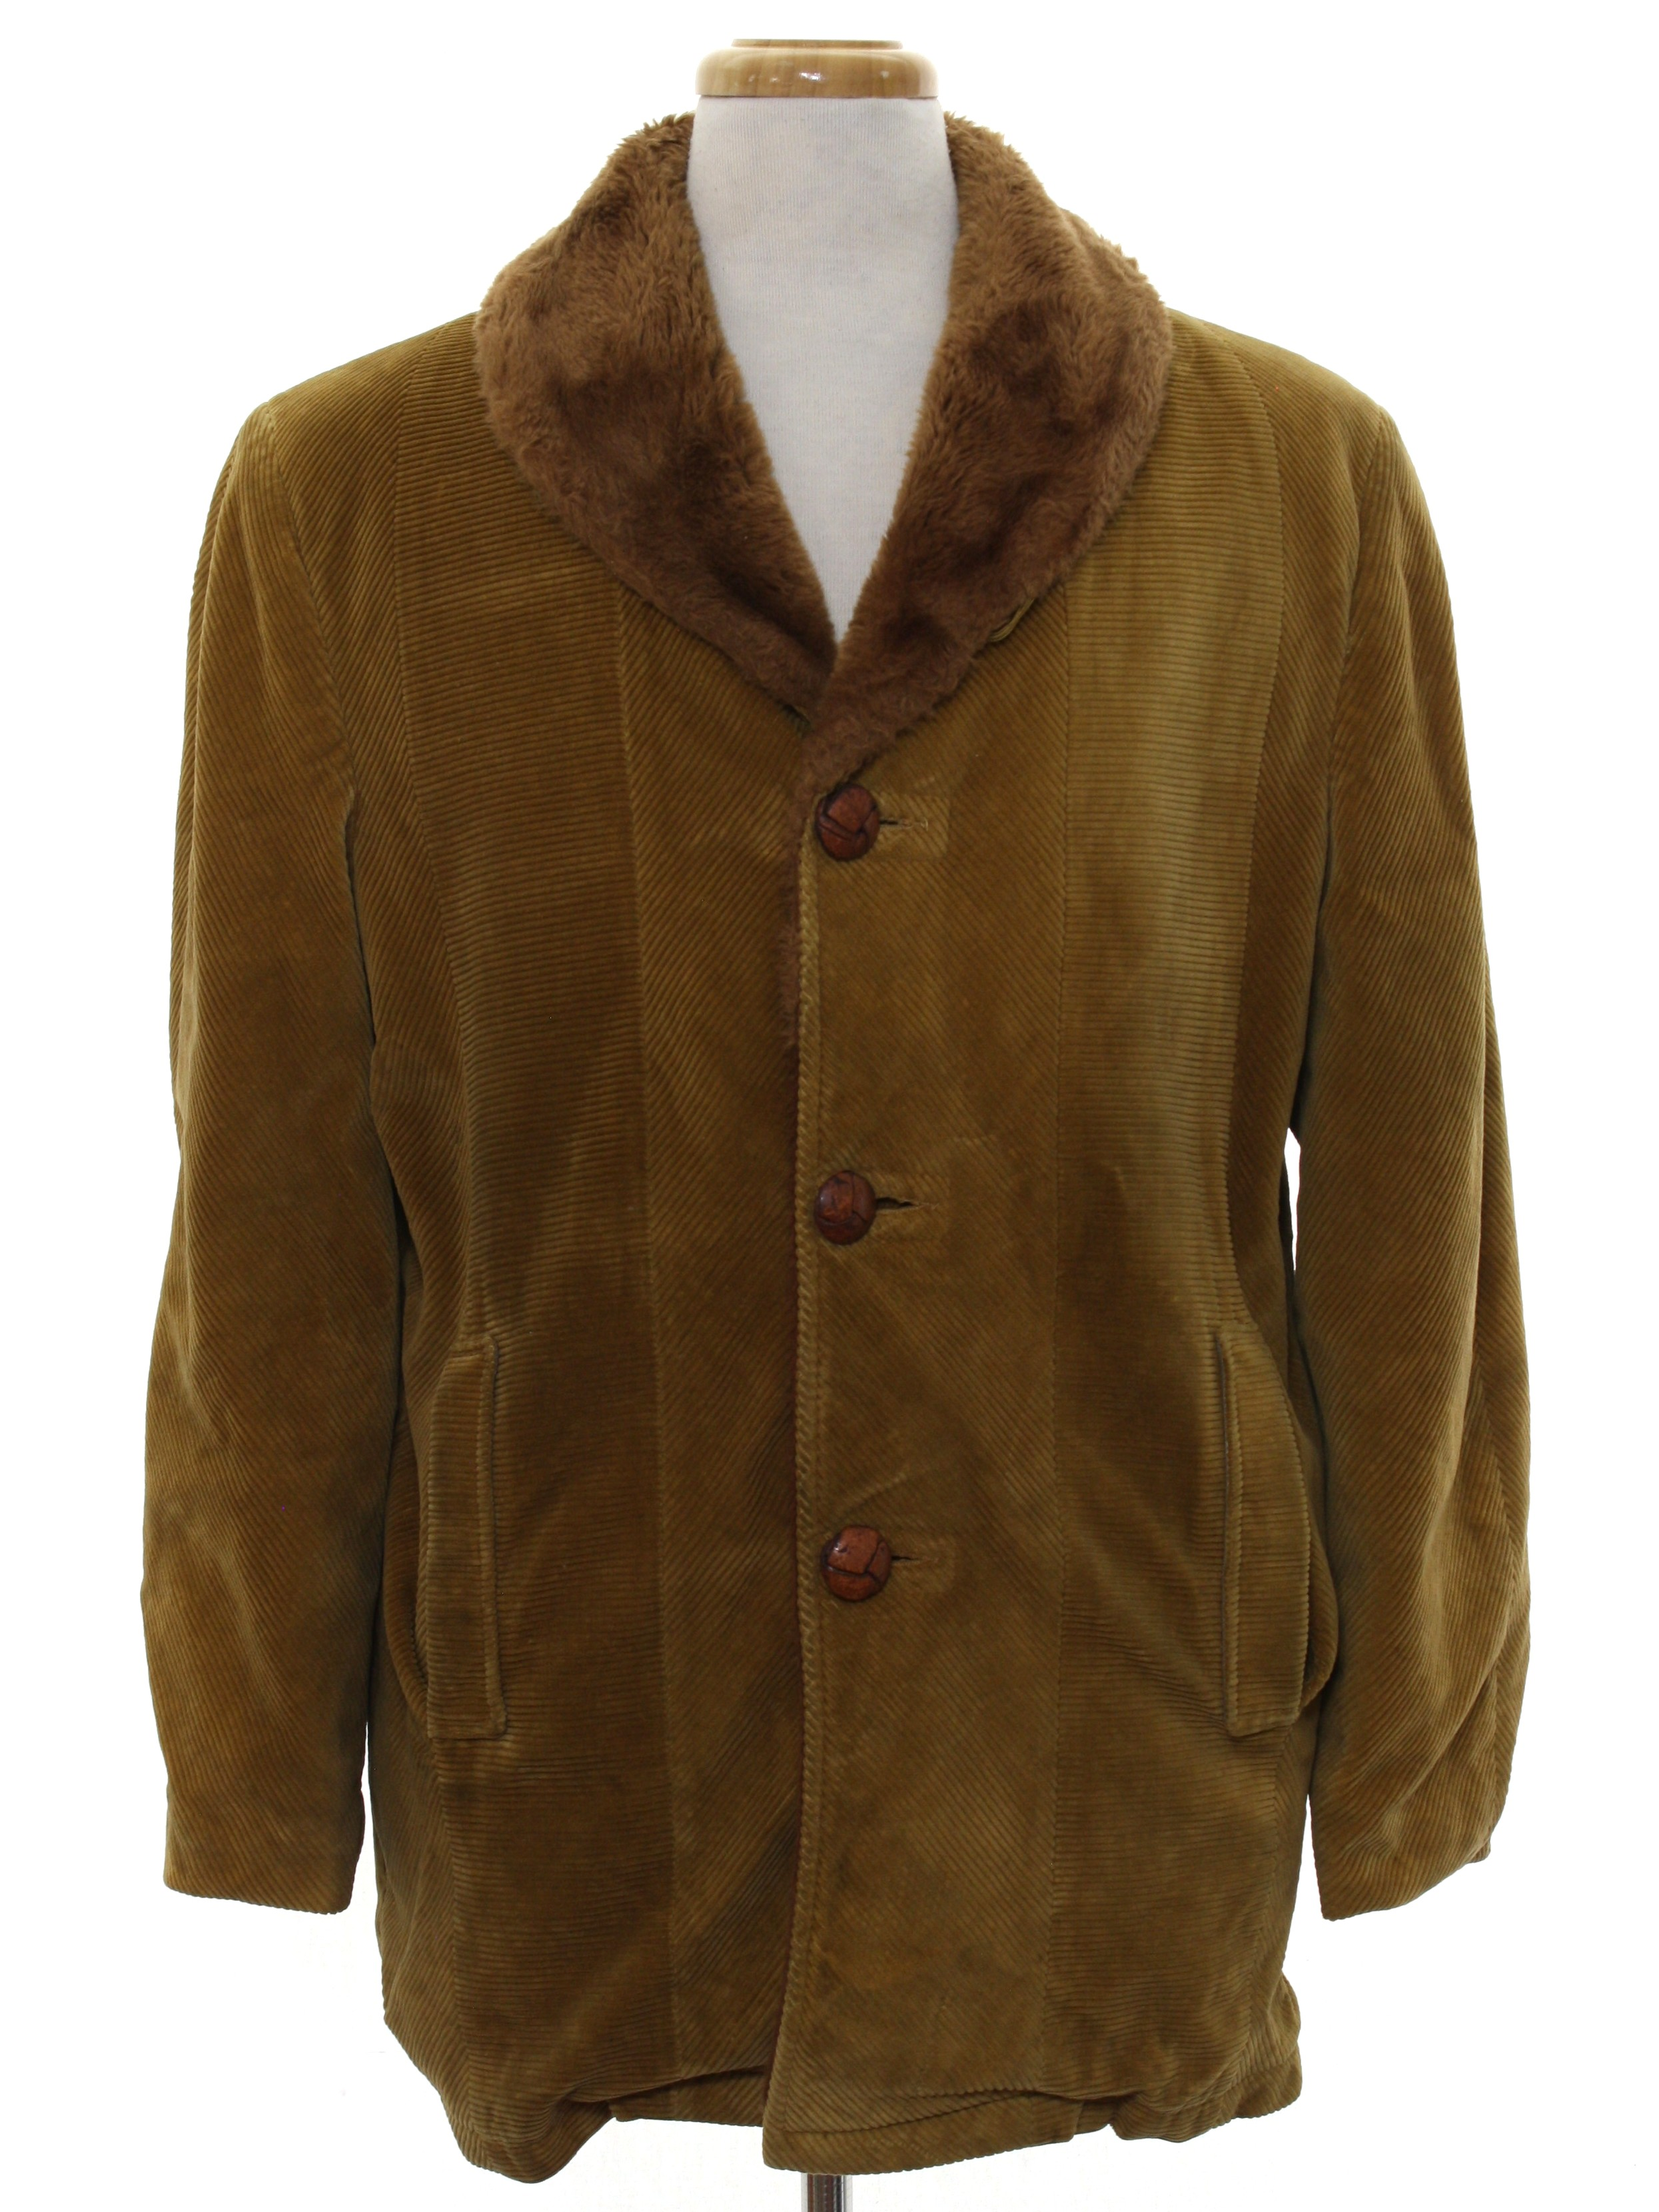 Cresco 1960s Vintage Jacket: 60s -Cresco- Mens medium brown wide ...